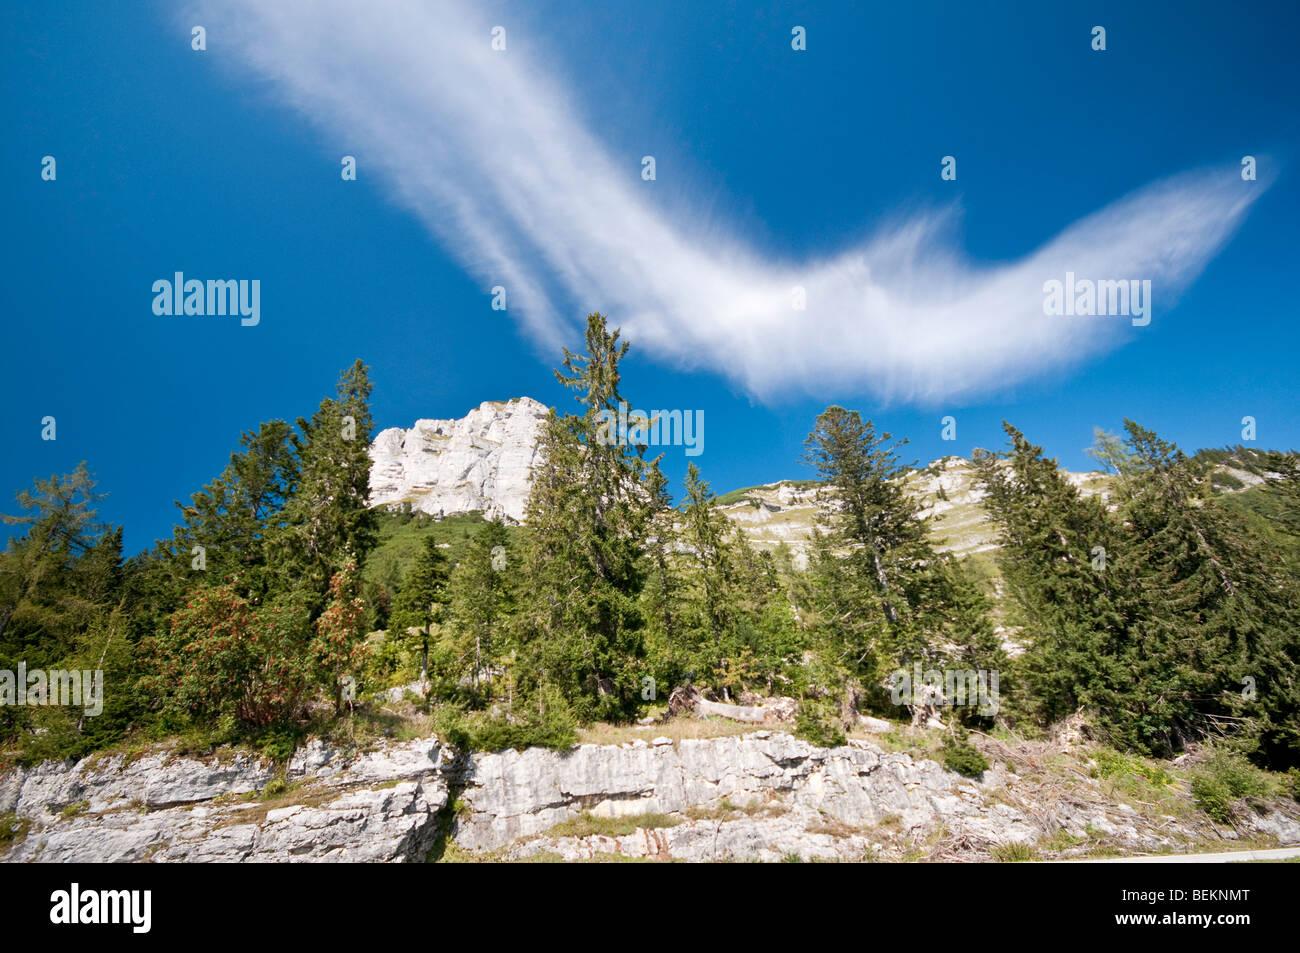 The Loser mountain in Steiermark Austria - Stock Image